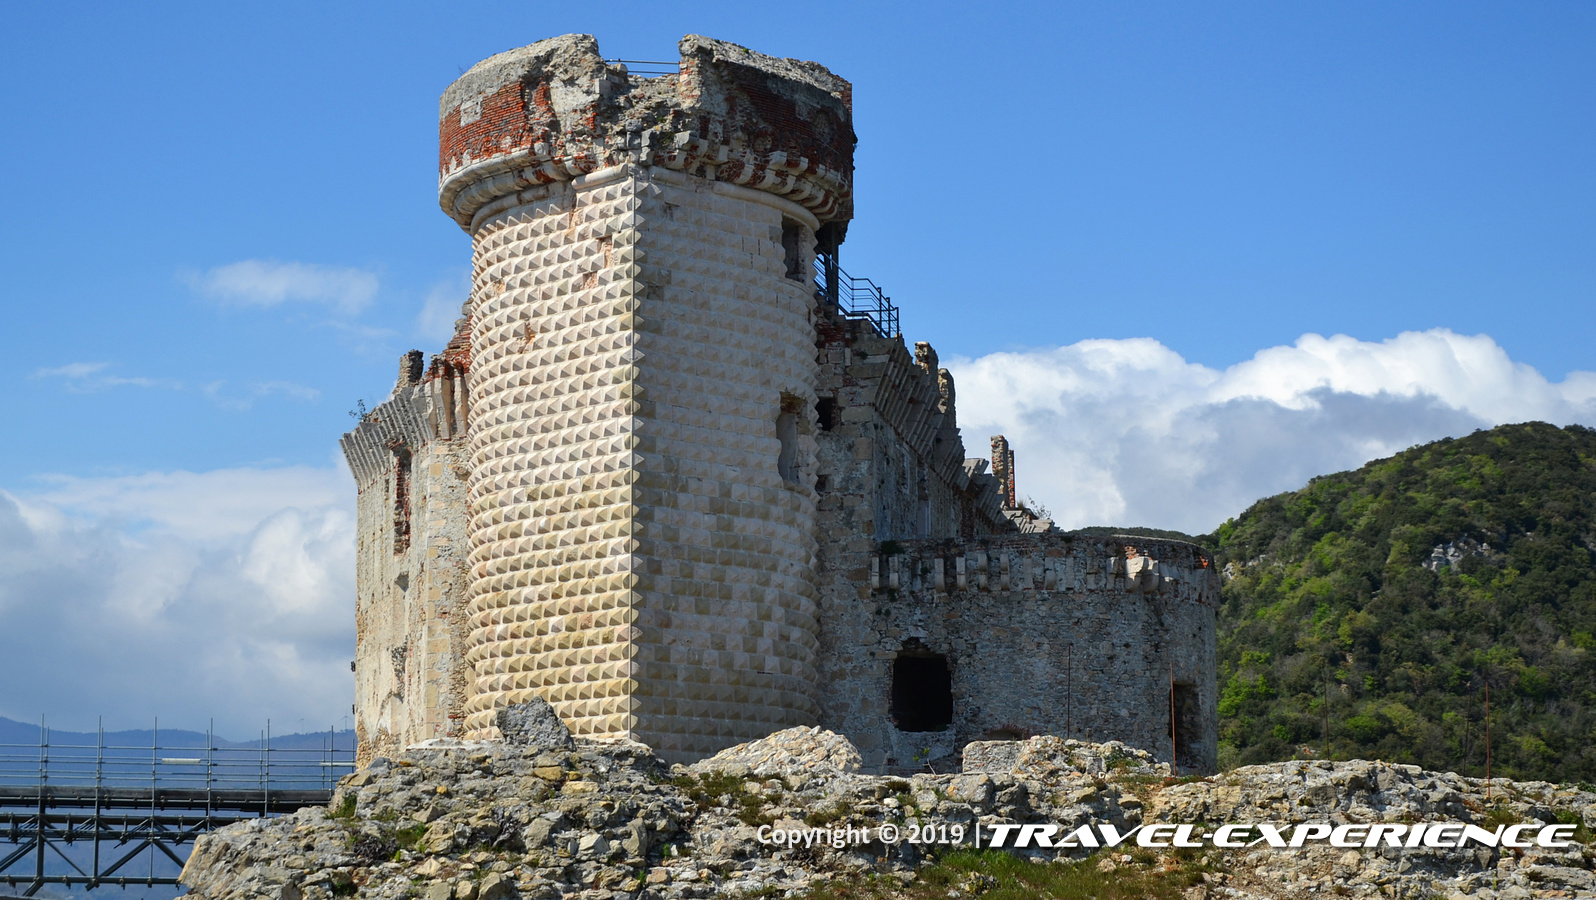 Finalborgo, Finale Ligure, Castel Gavone, Torre dei Diiamanti